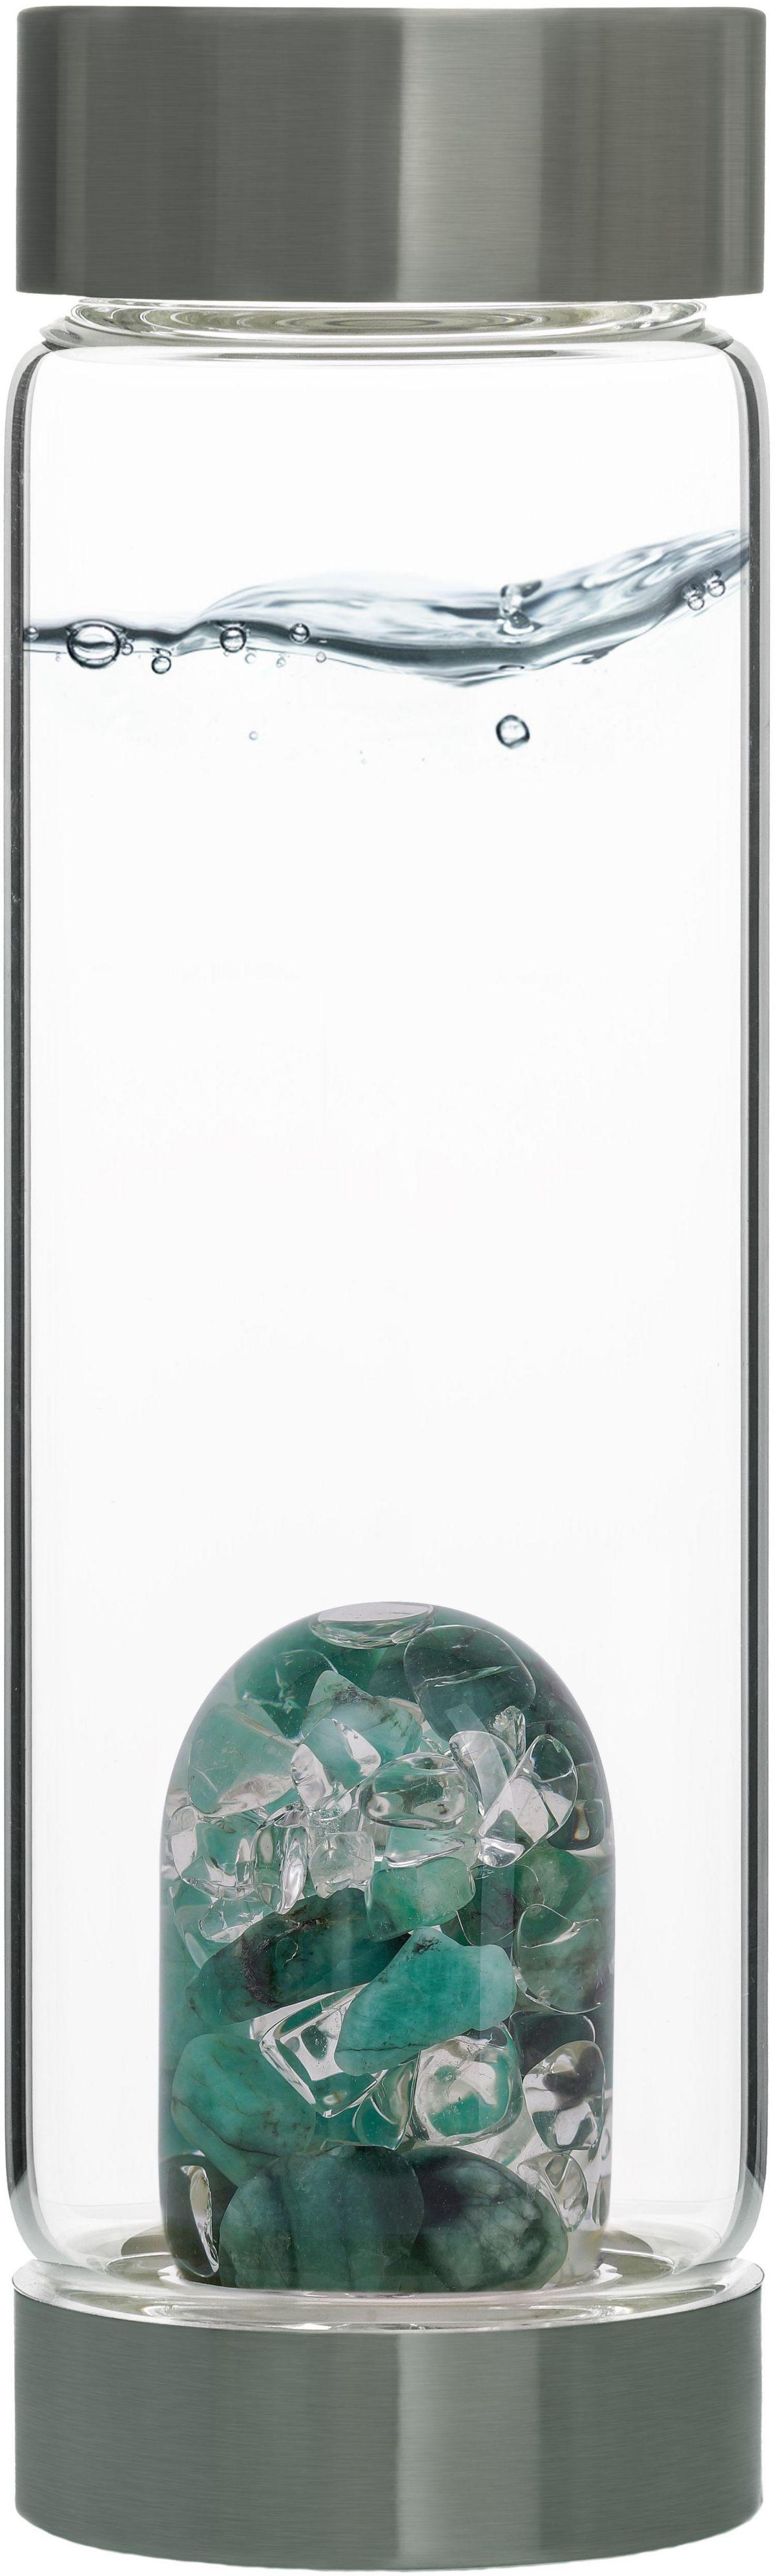 VitaJuwel Edelsteinflasche ViA Vitality (Smarag...